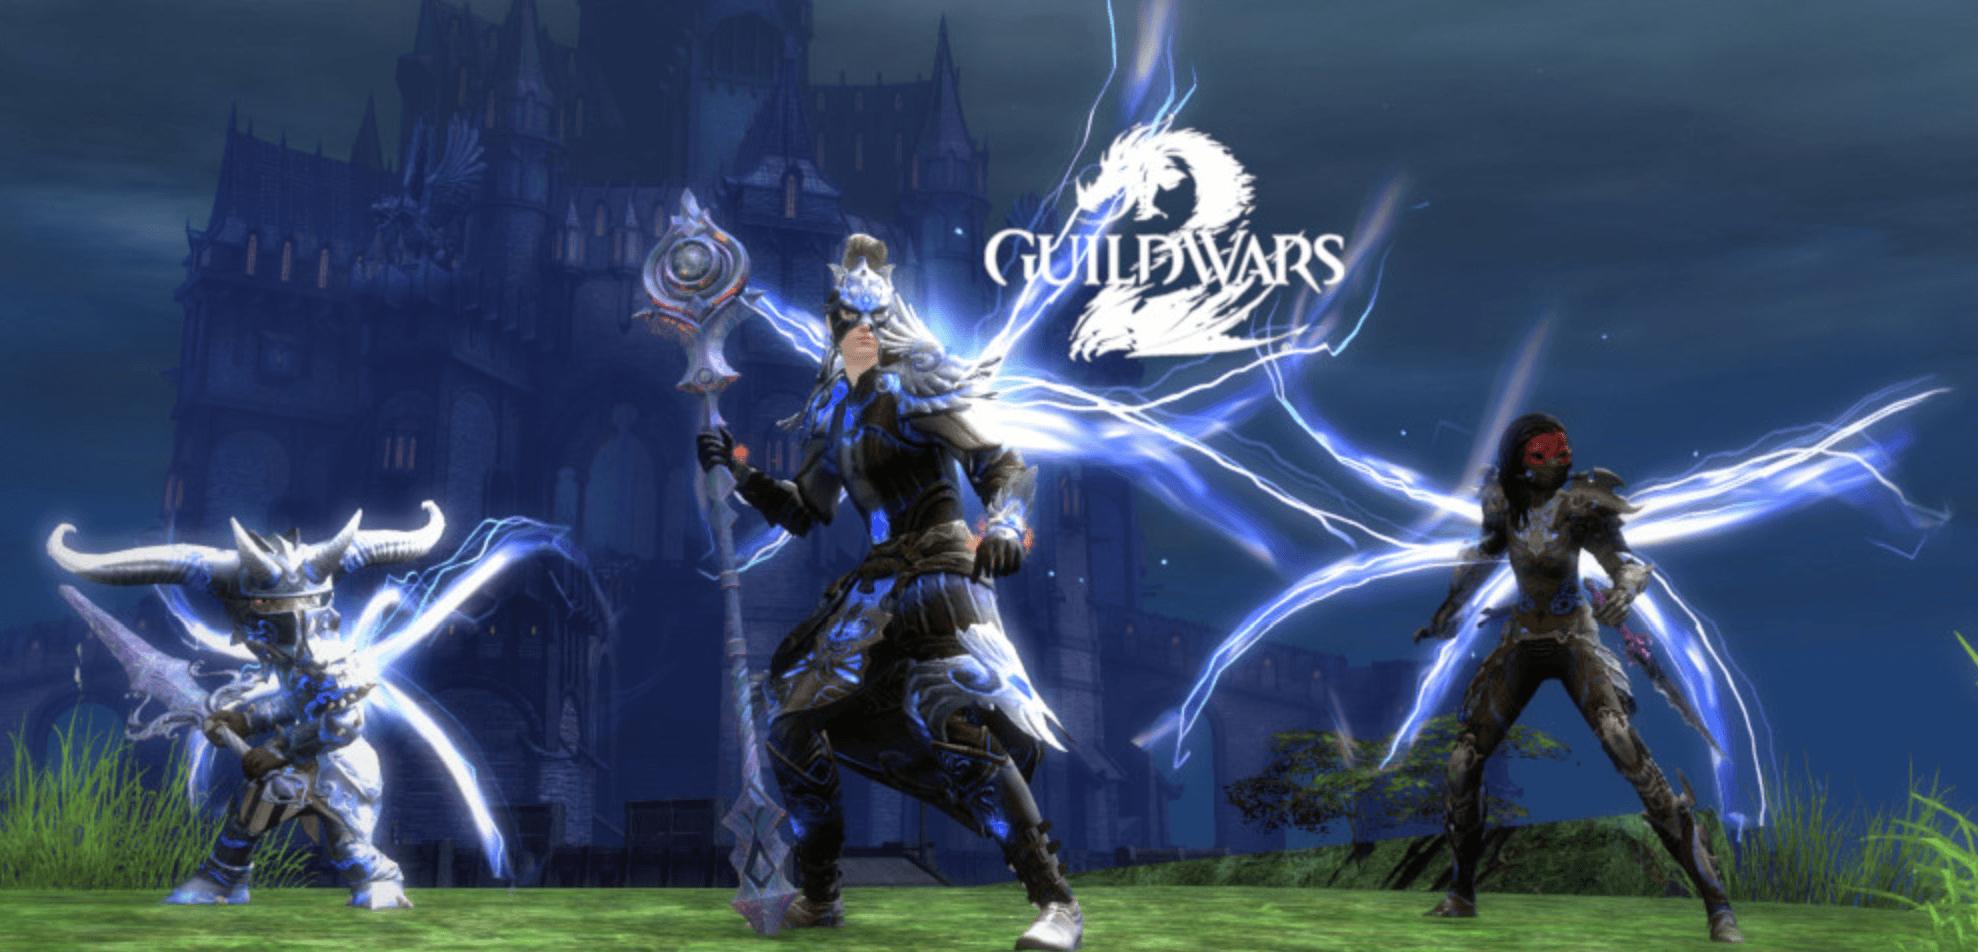 guild wars 2 online showing 3 fighters